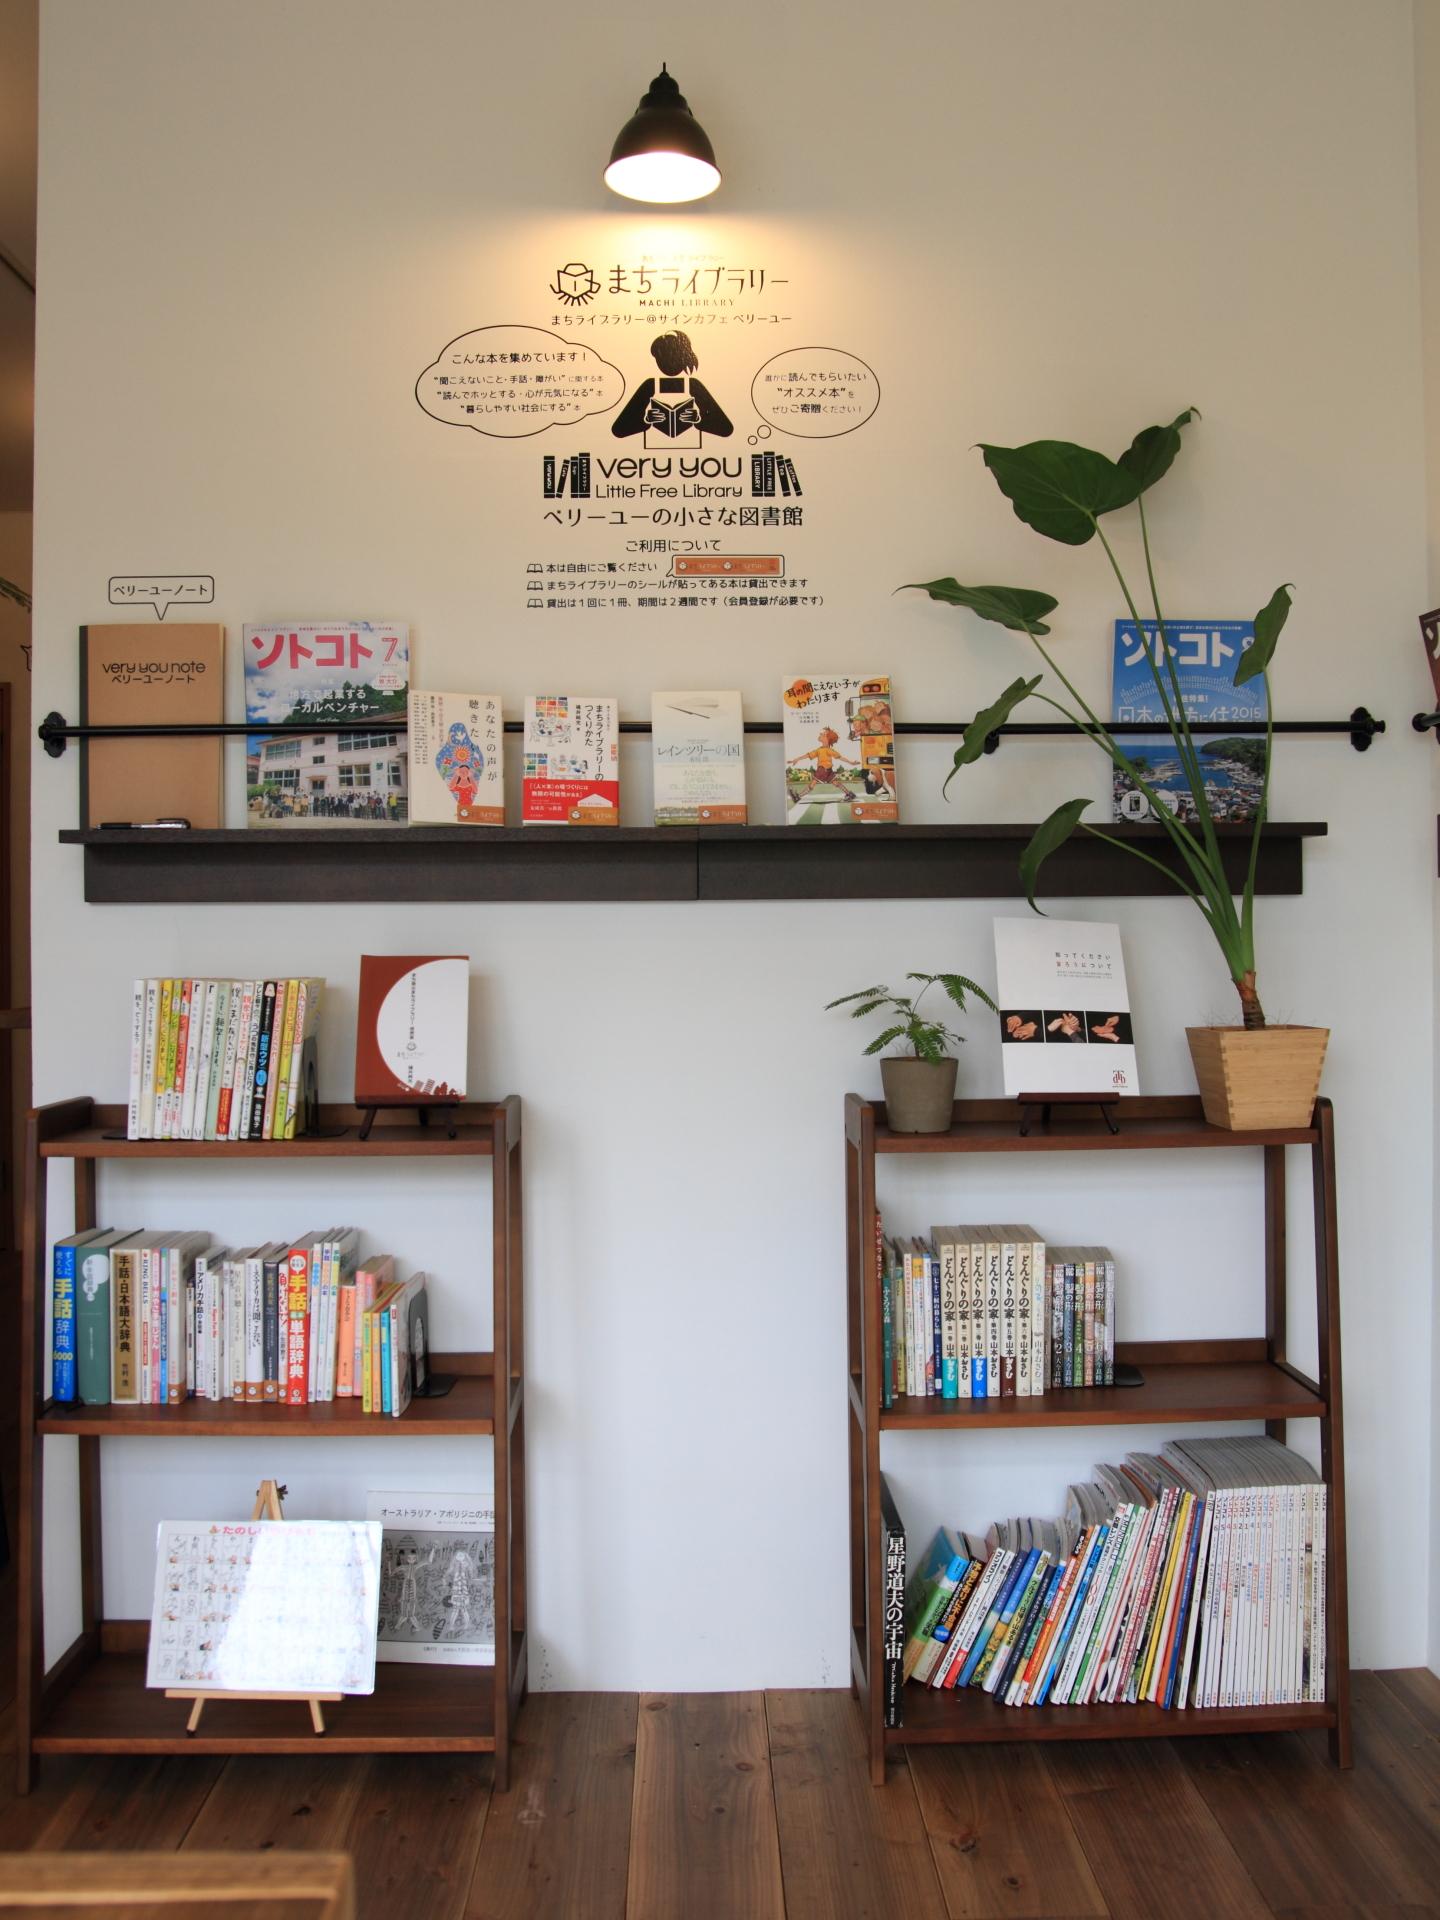 veryyou Library2